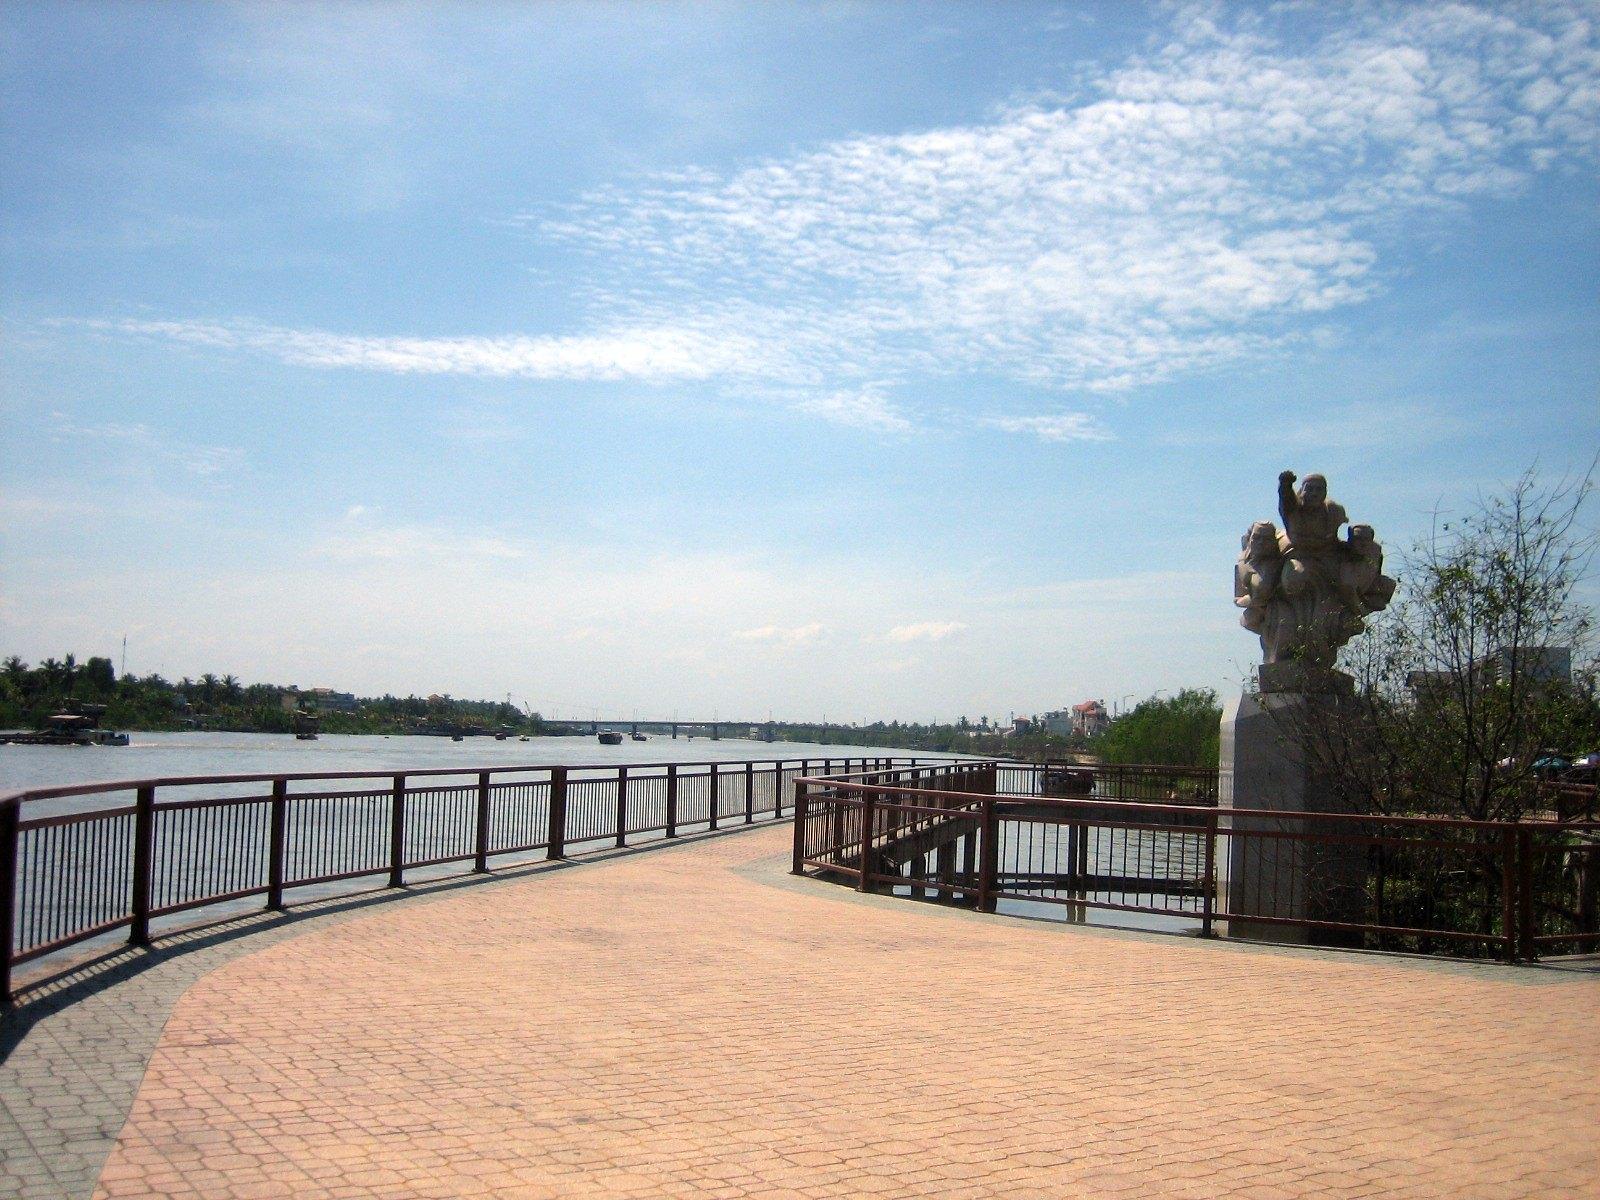 Riverside in Bên Tre City, Vietnam